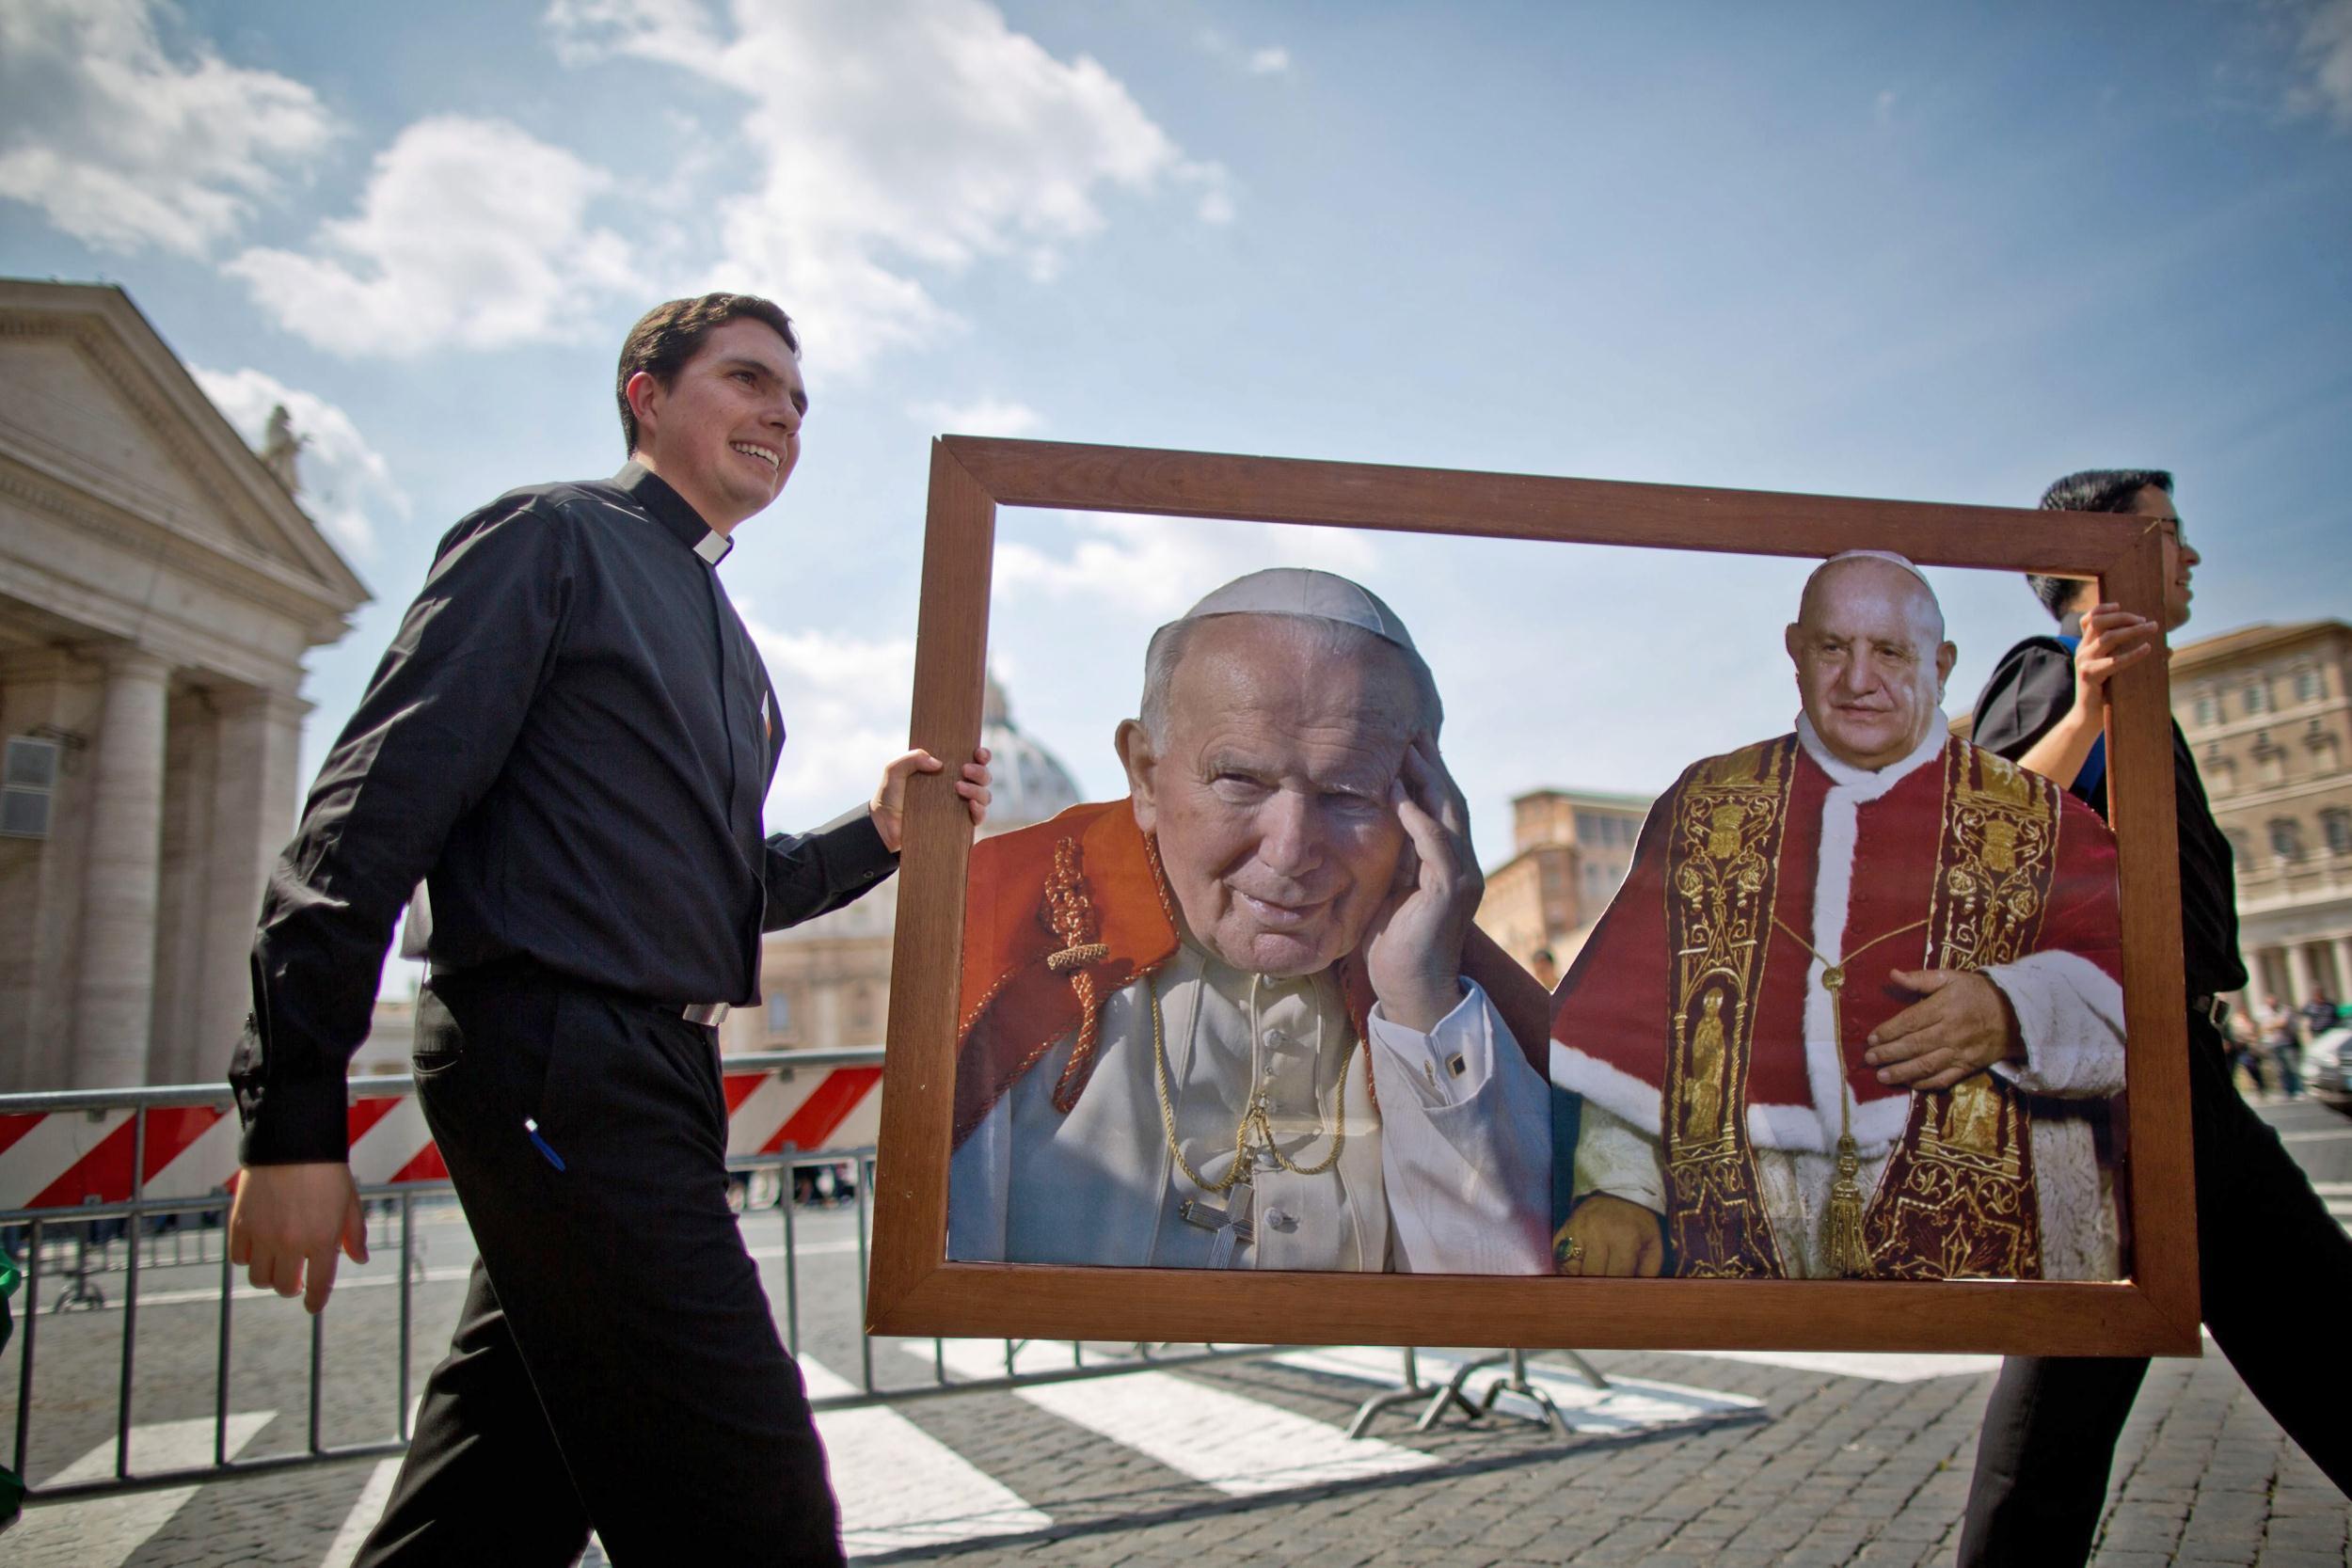 Image: Waiting for canonization of John Paul II and John XXIII